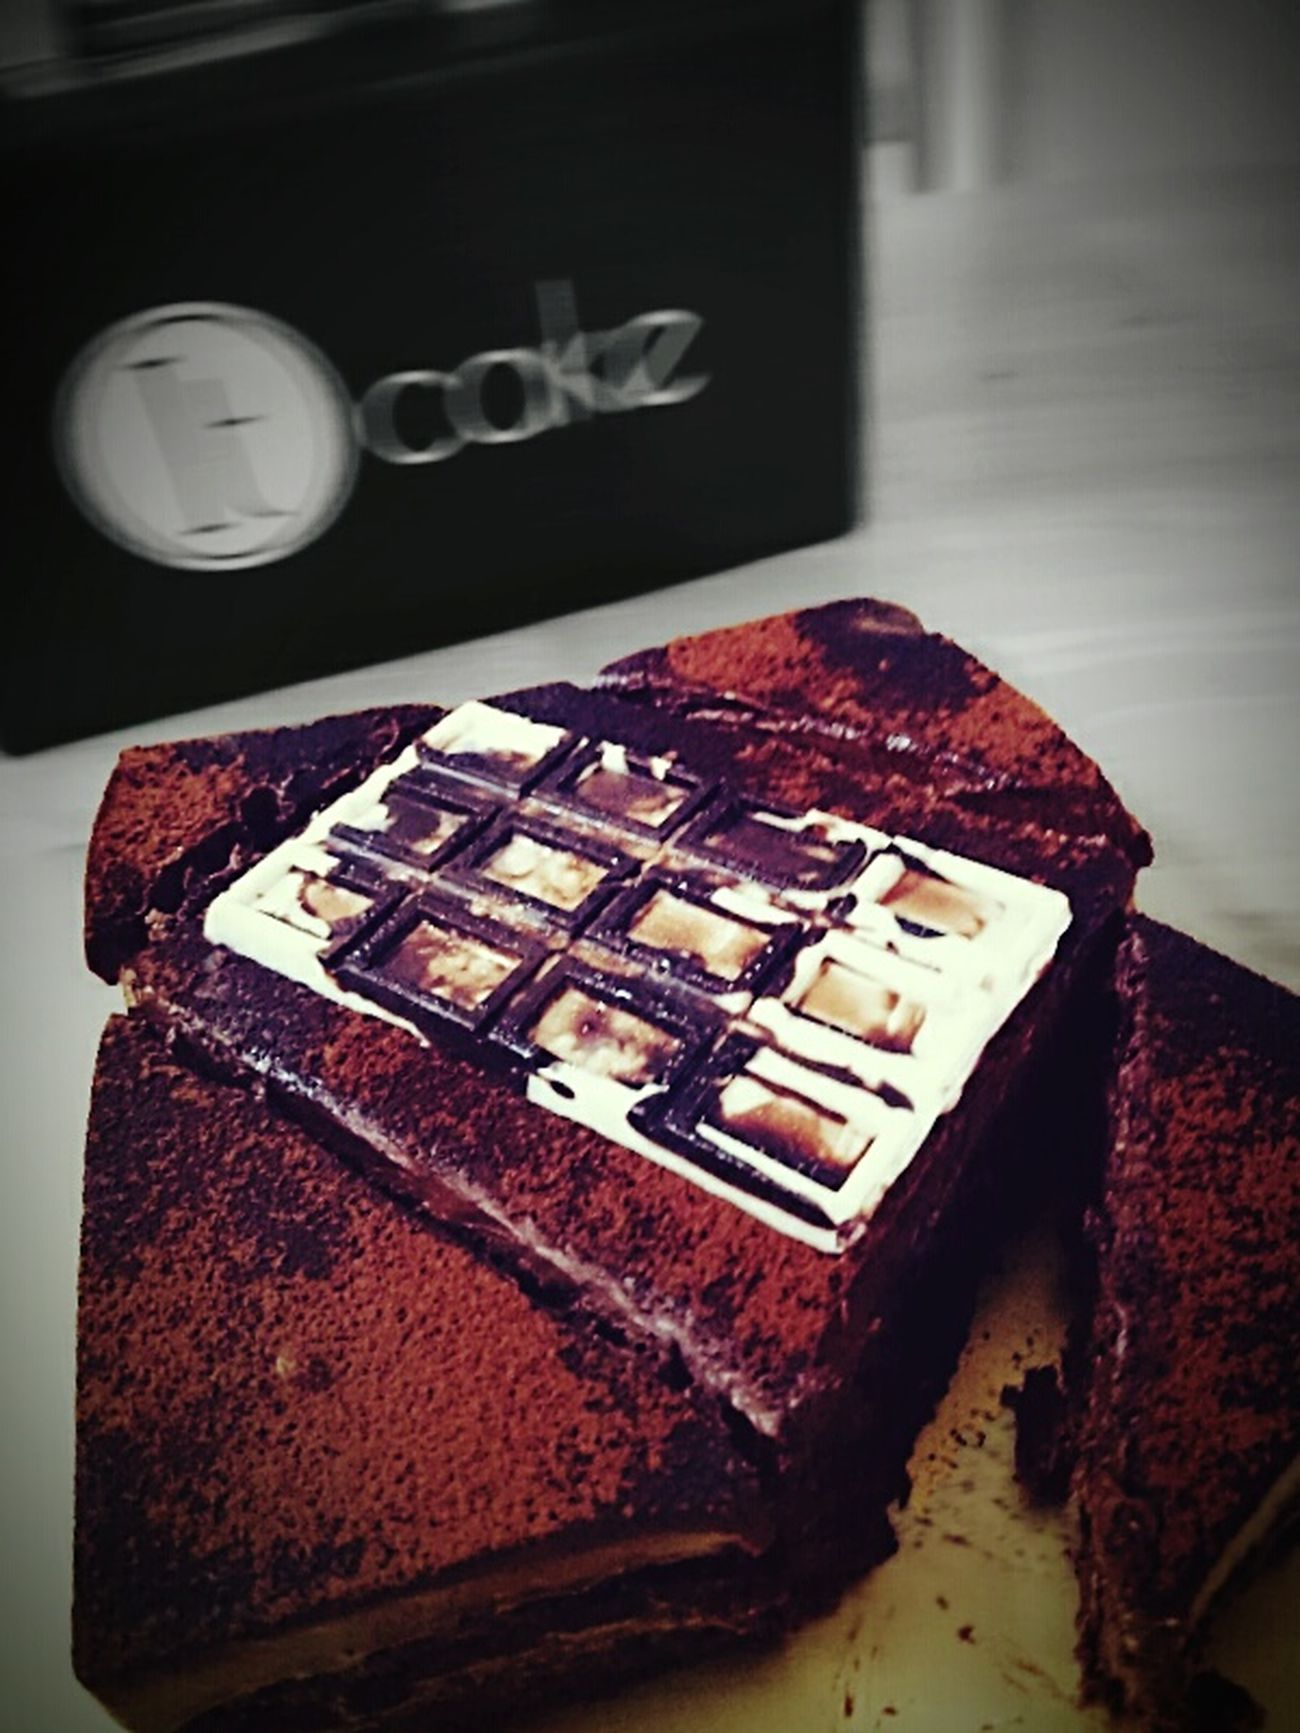 Dessert Delish! Cake♥ Midnight Snack Sweettreat Meltinyourmouth Chocolatelover Foodporn❤️